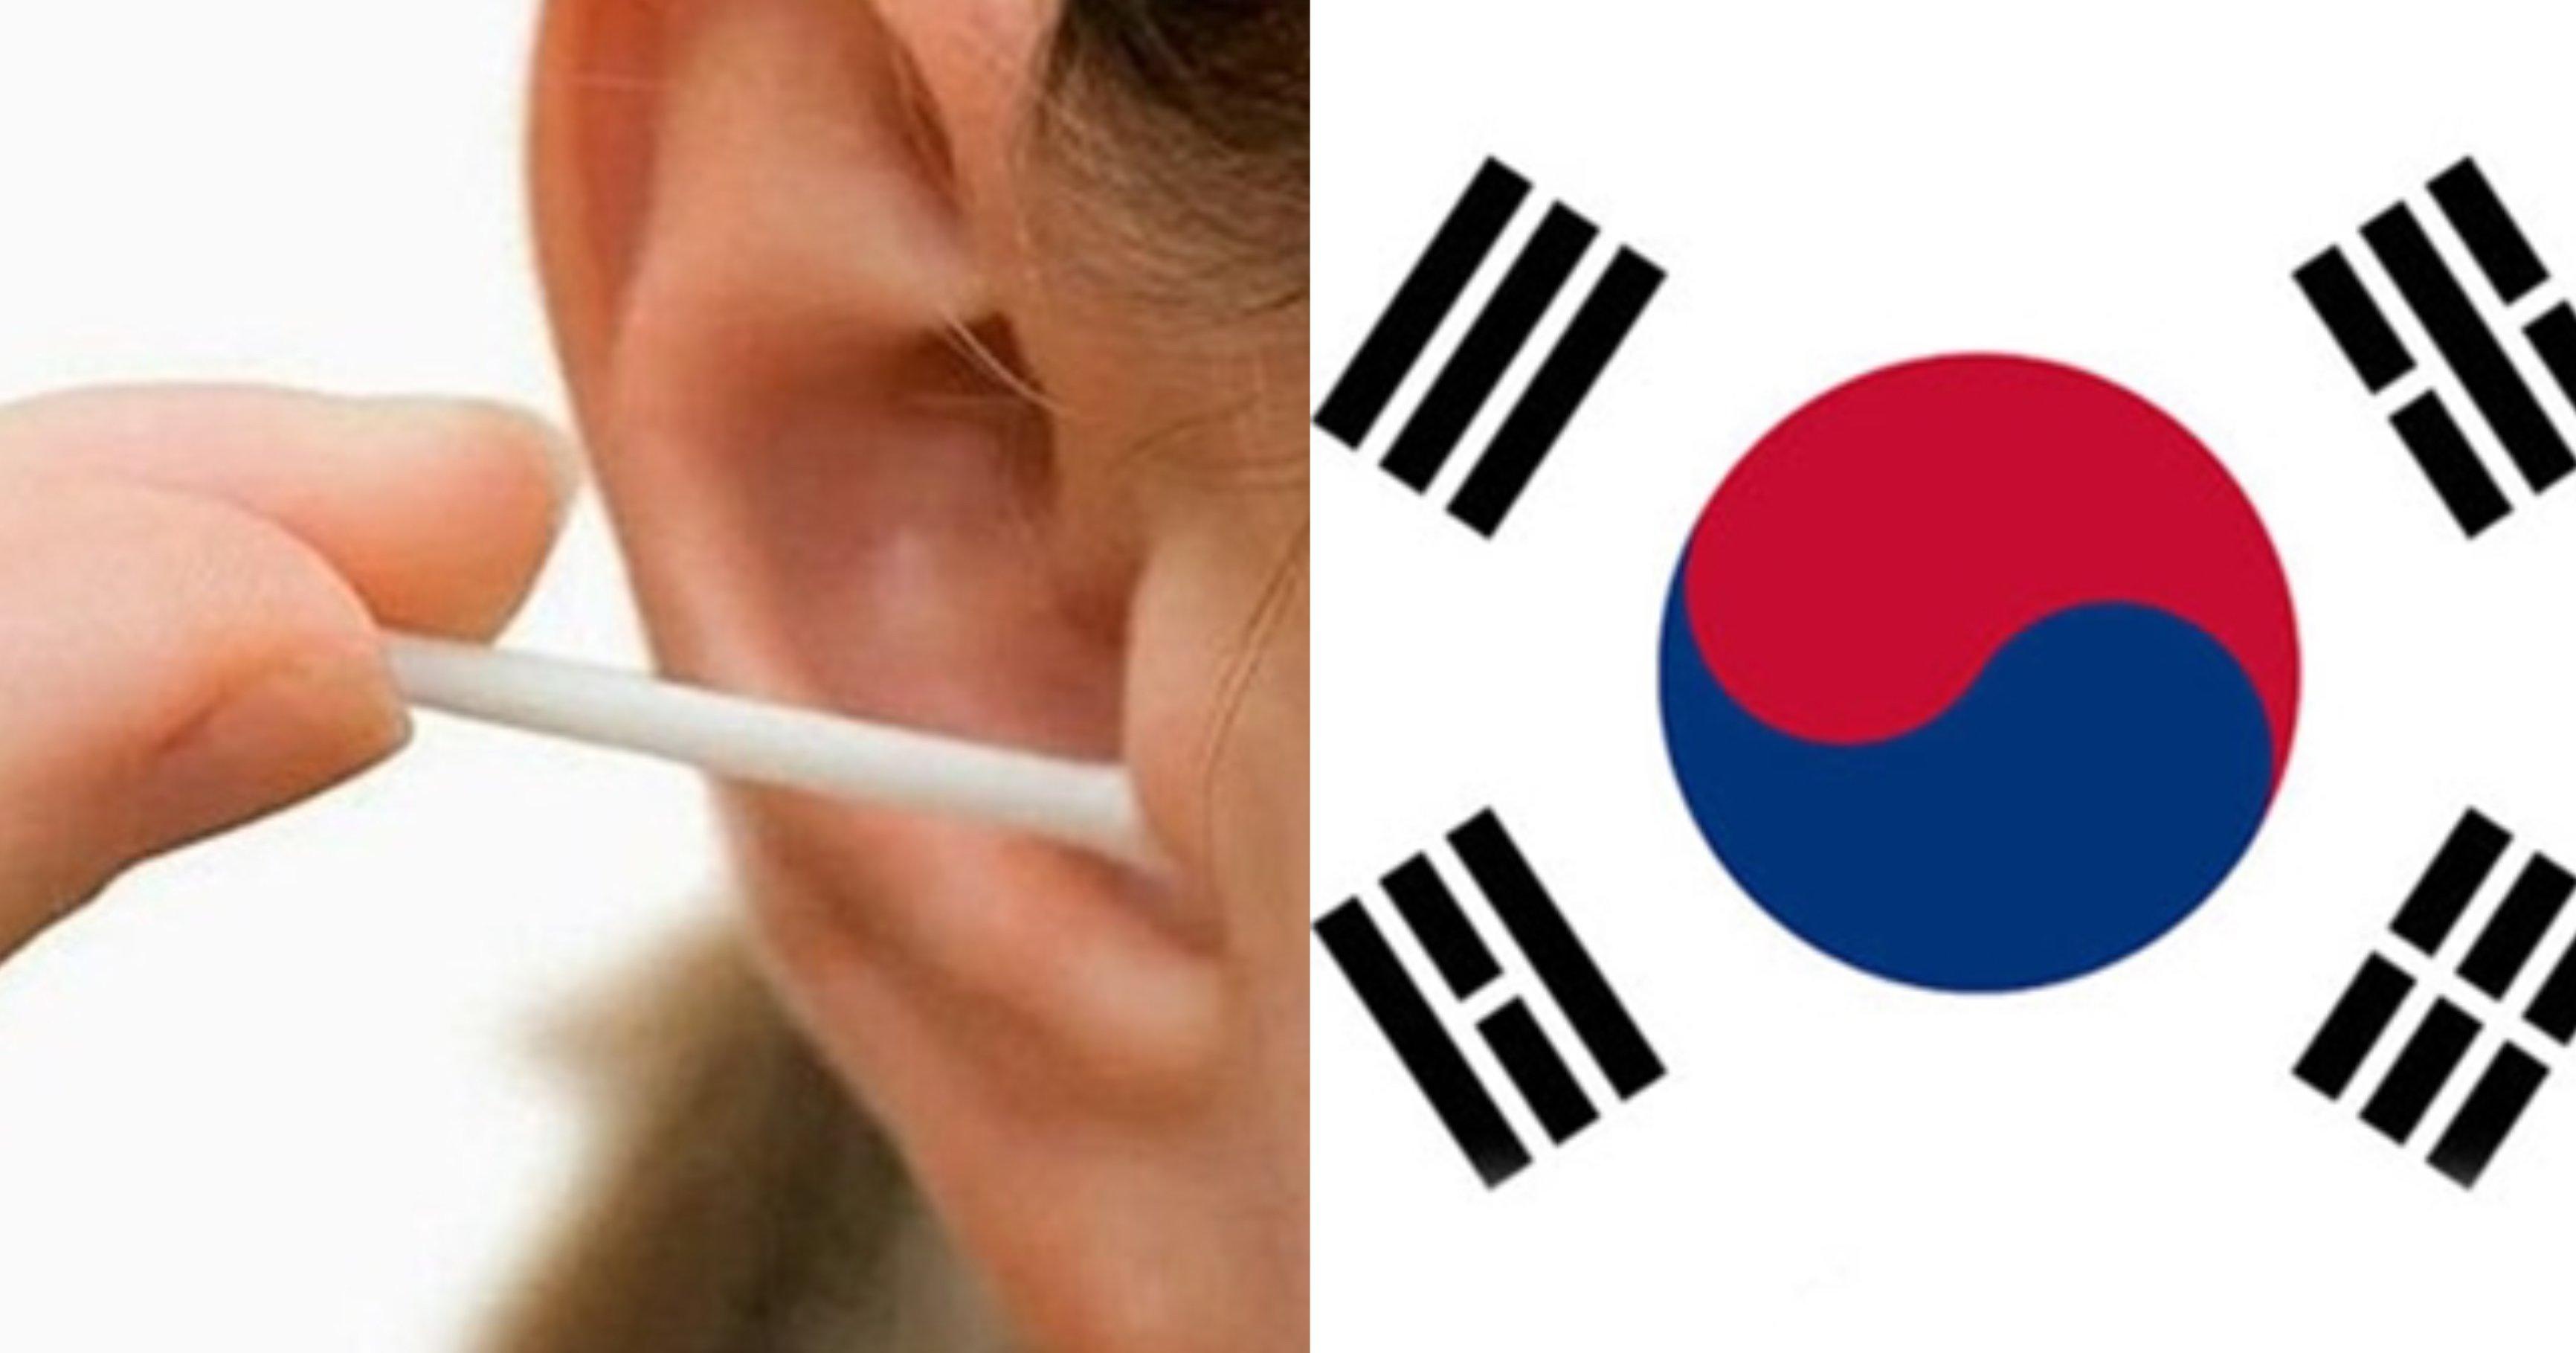 img 9b71cefc0bab 1.jpeg?resize=412,275 - 전 세계에서 한국인만 가지고 있다는 신기한 신체 특징 5가지(+사진)